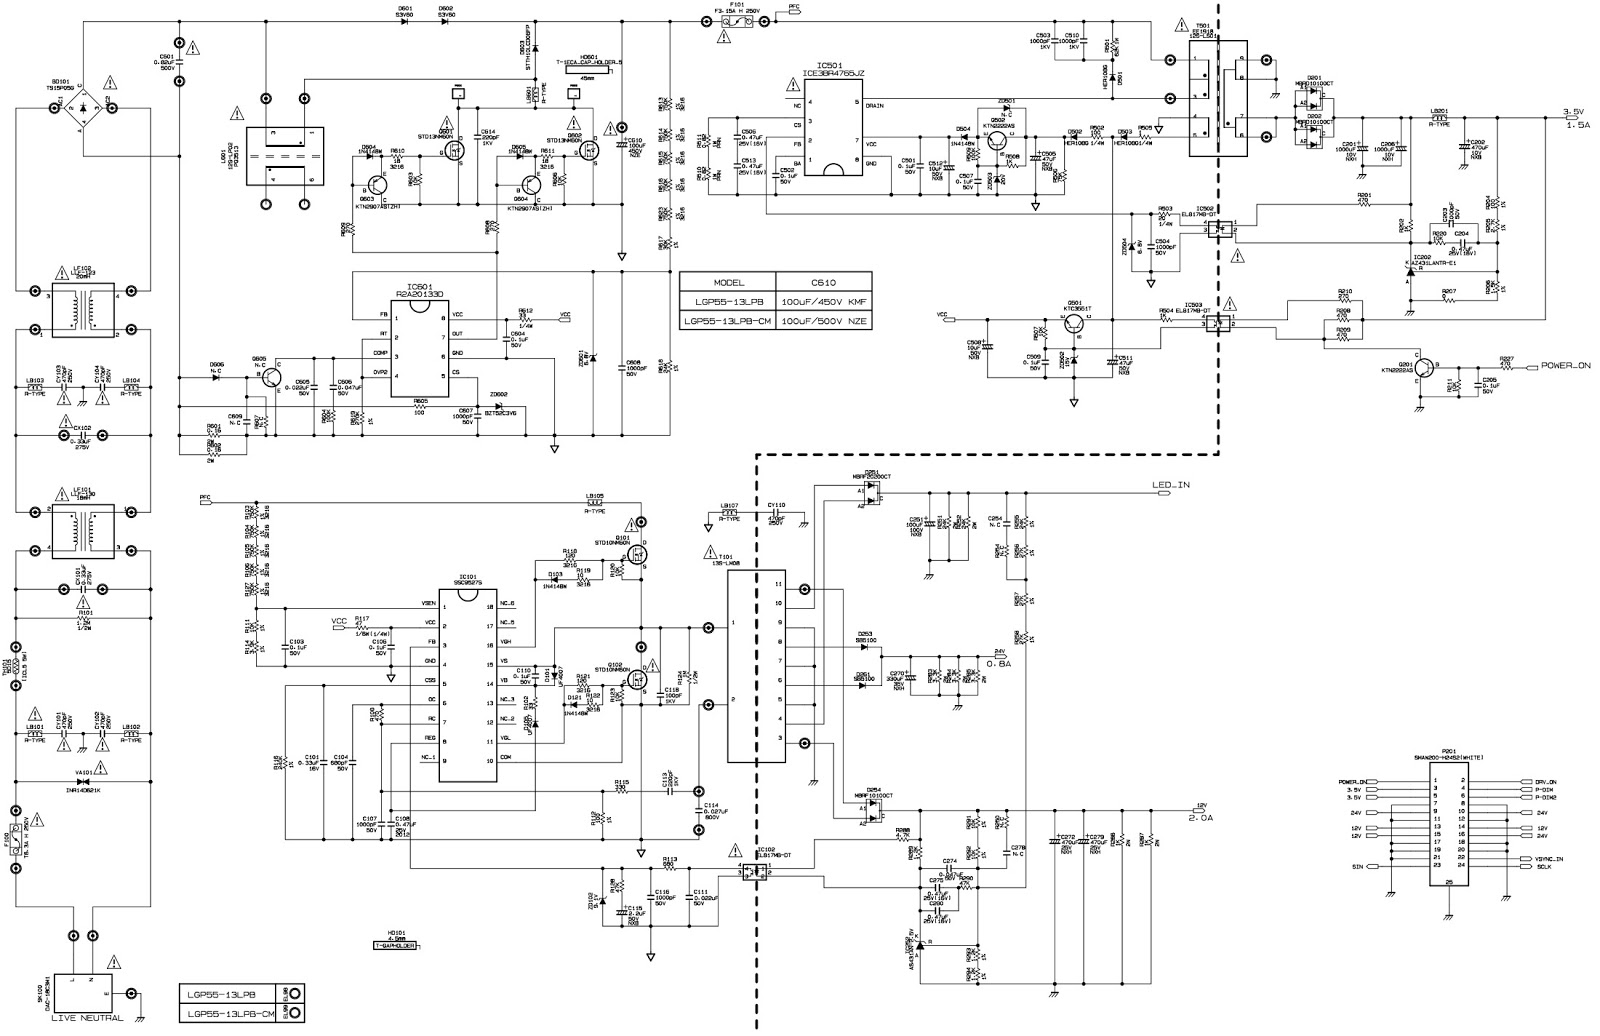 Wiring Diagrams Led Wiring Circuit Diagram Electrical Wiring Diagrams